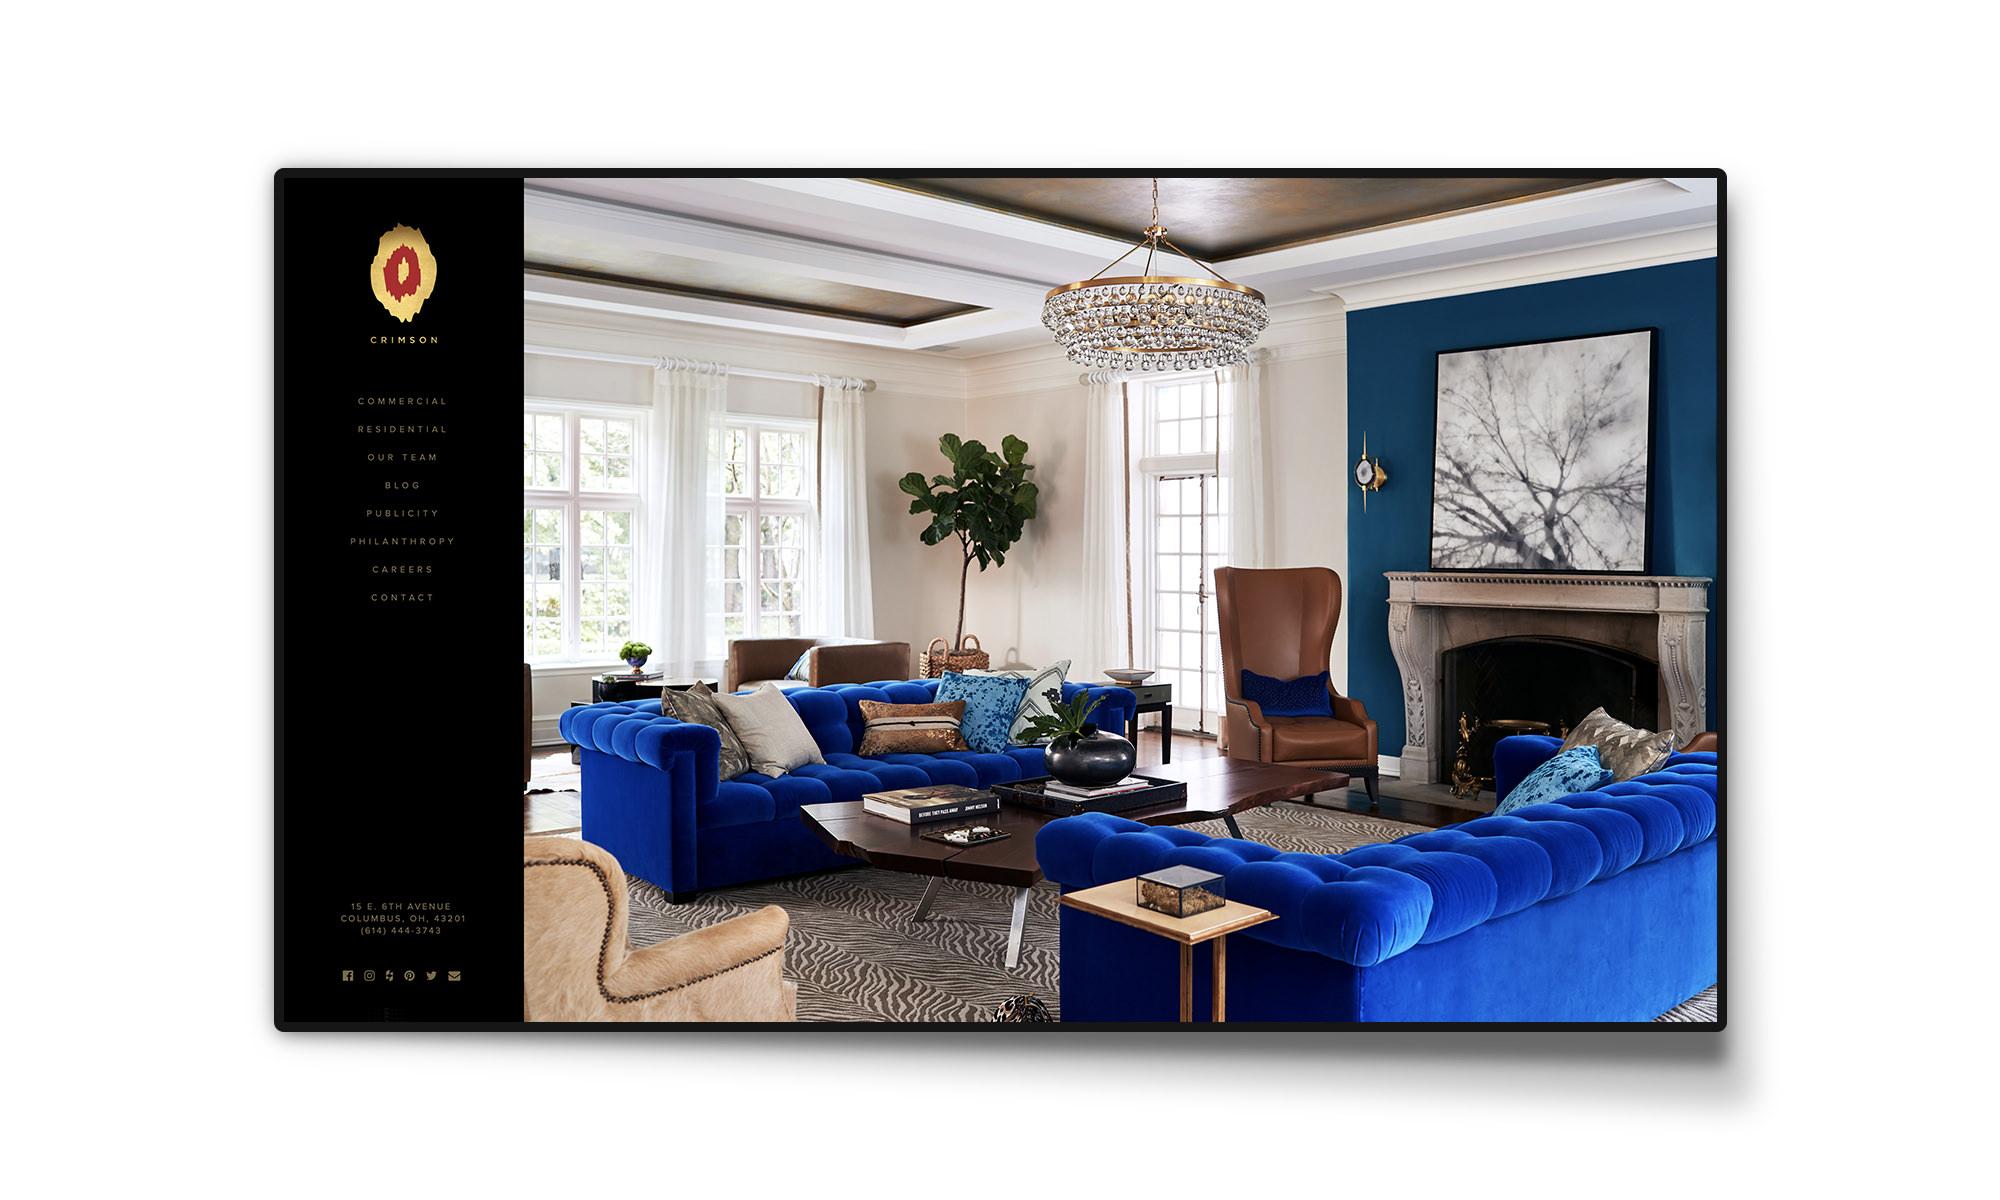 crimson-homepage-desktop.jpg